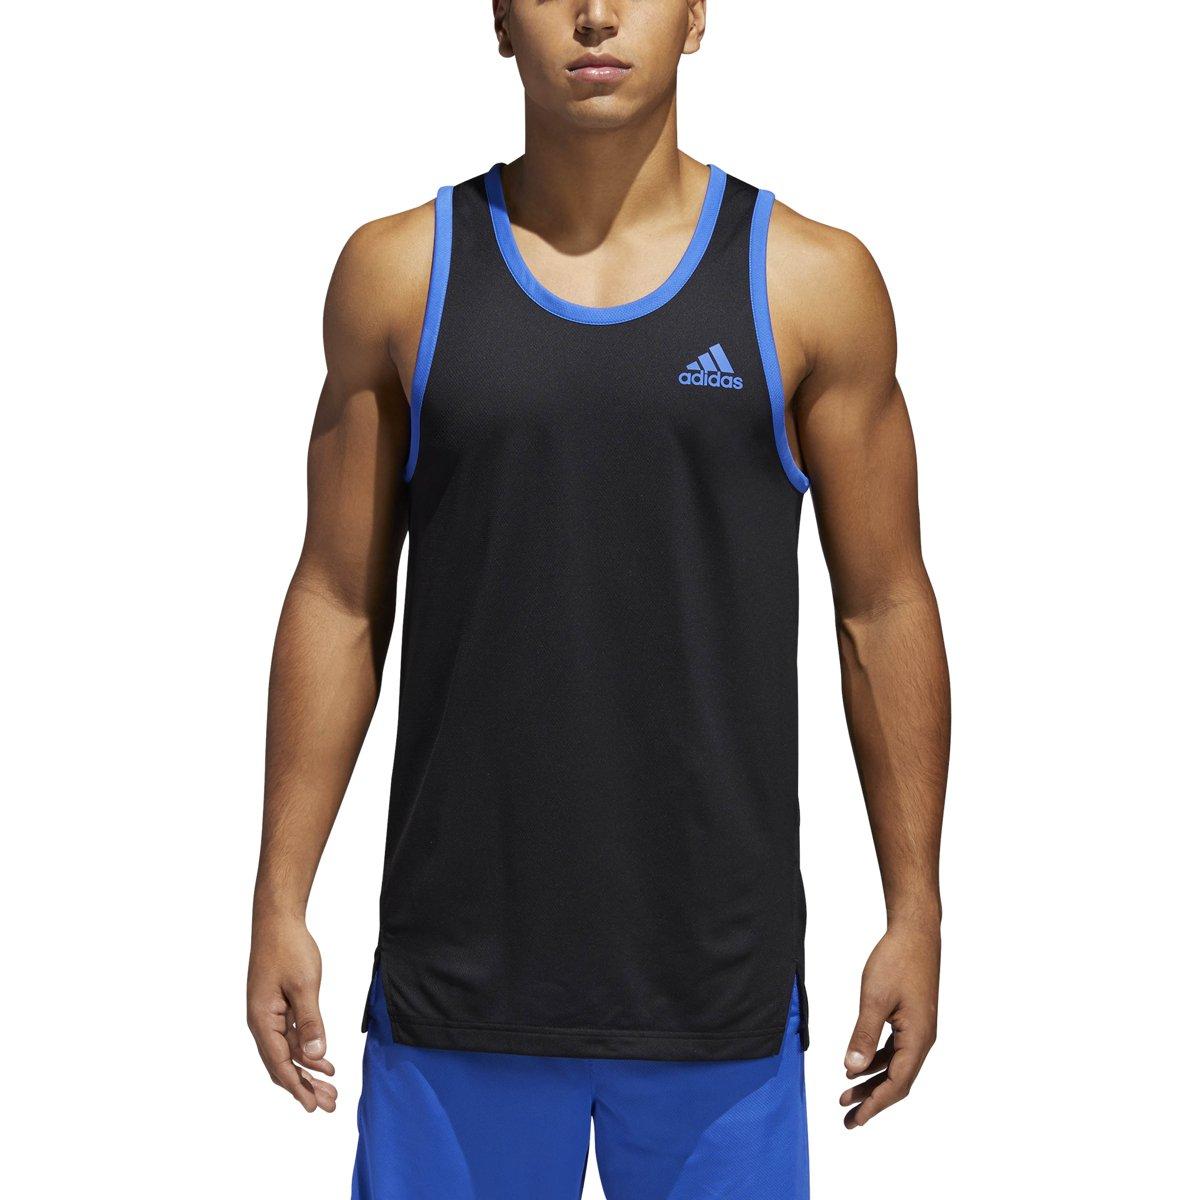 adidas Men's Sport Tank Top Black X-Large